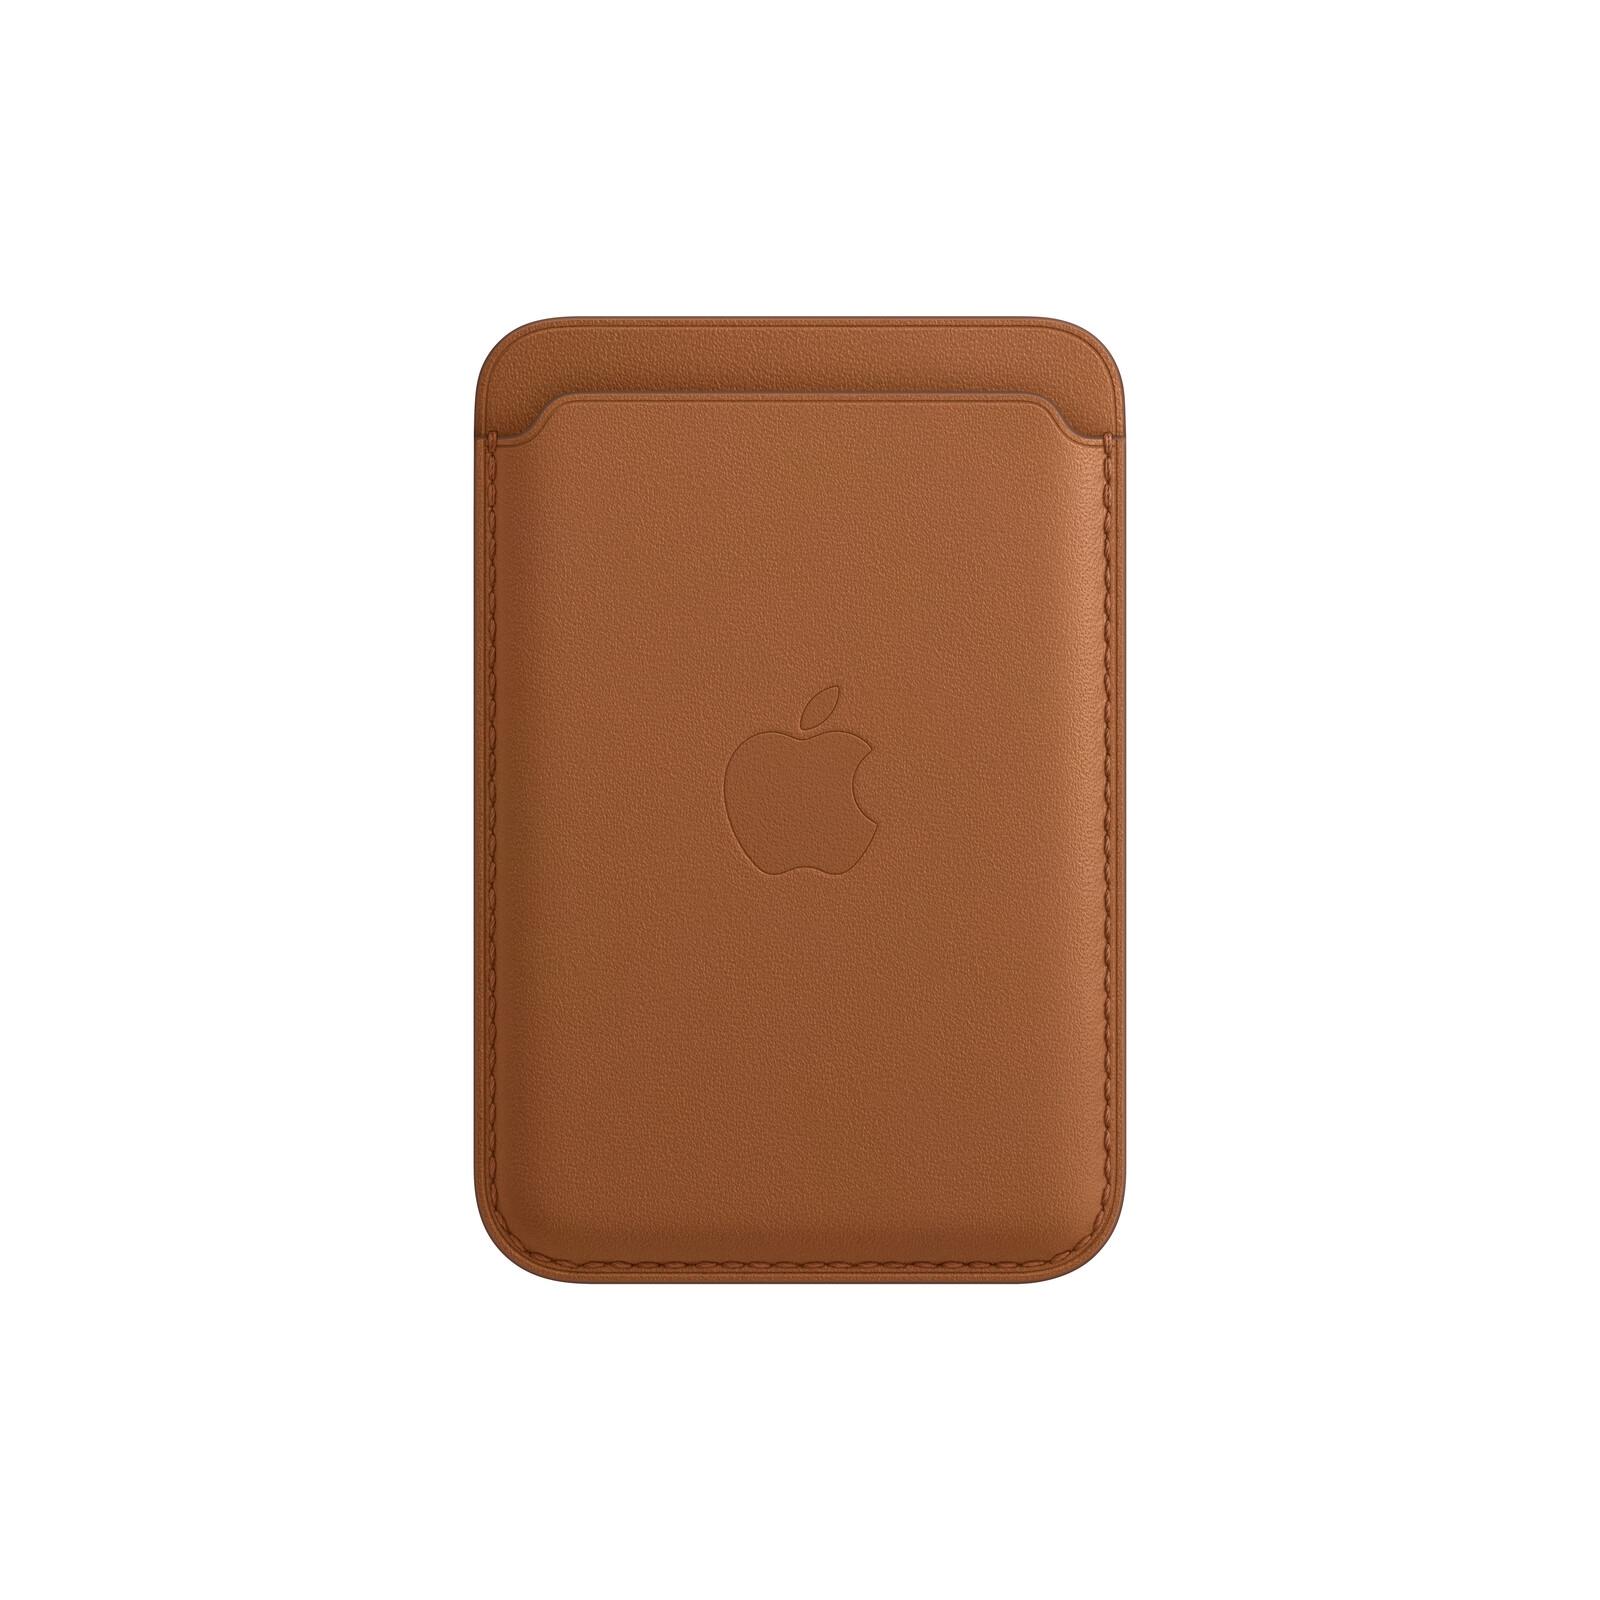 Apple iPhone Leder Wallet mit MagSafe sattelbraun